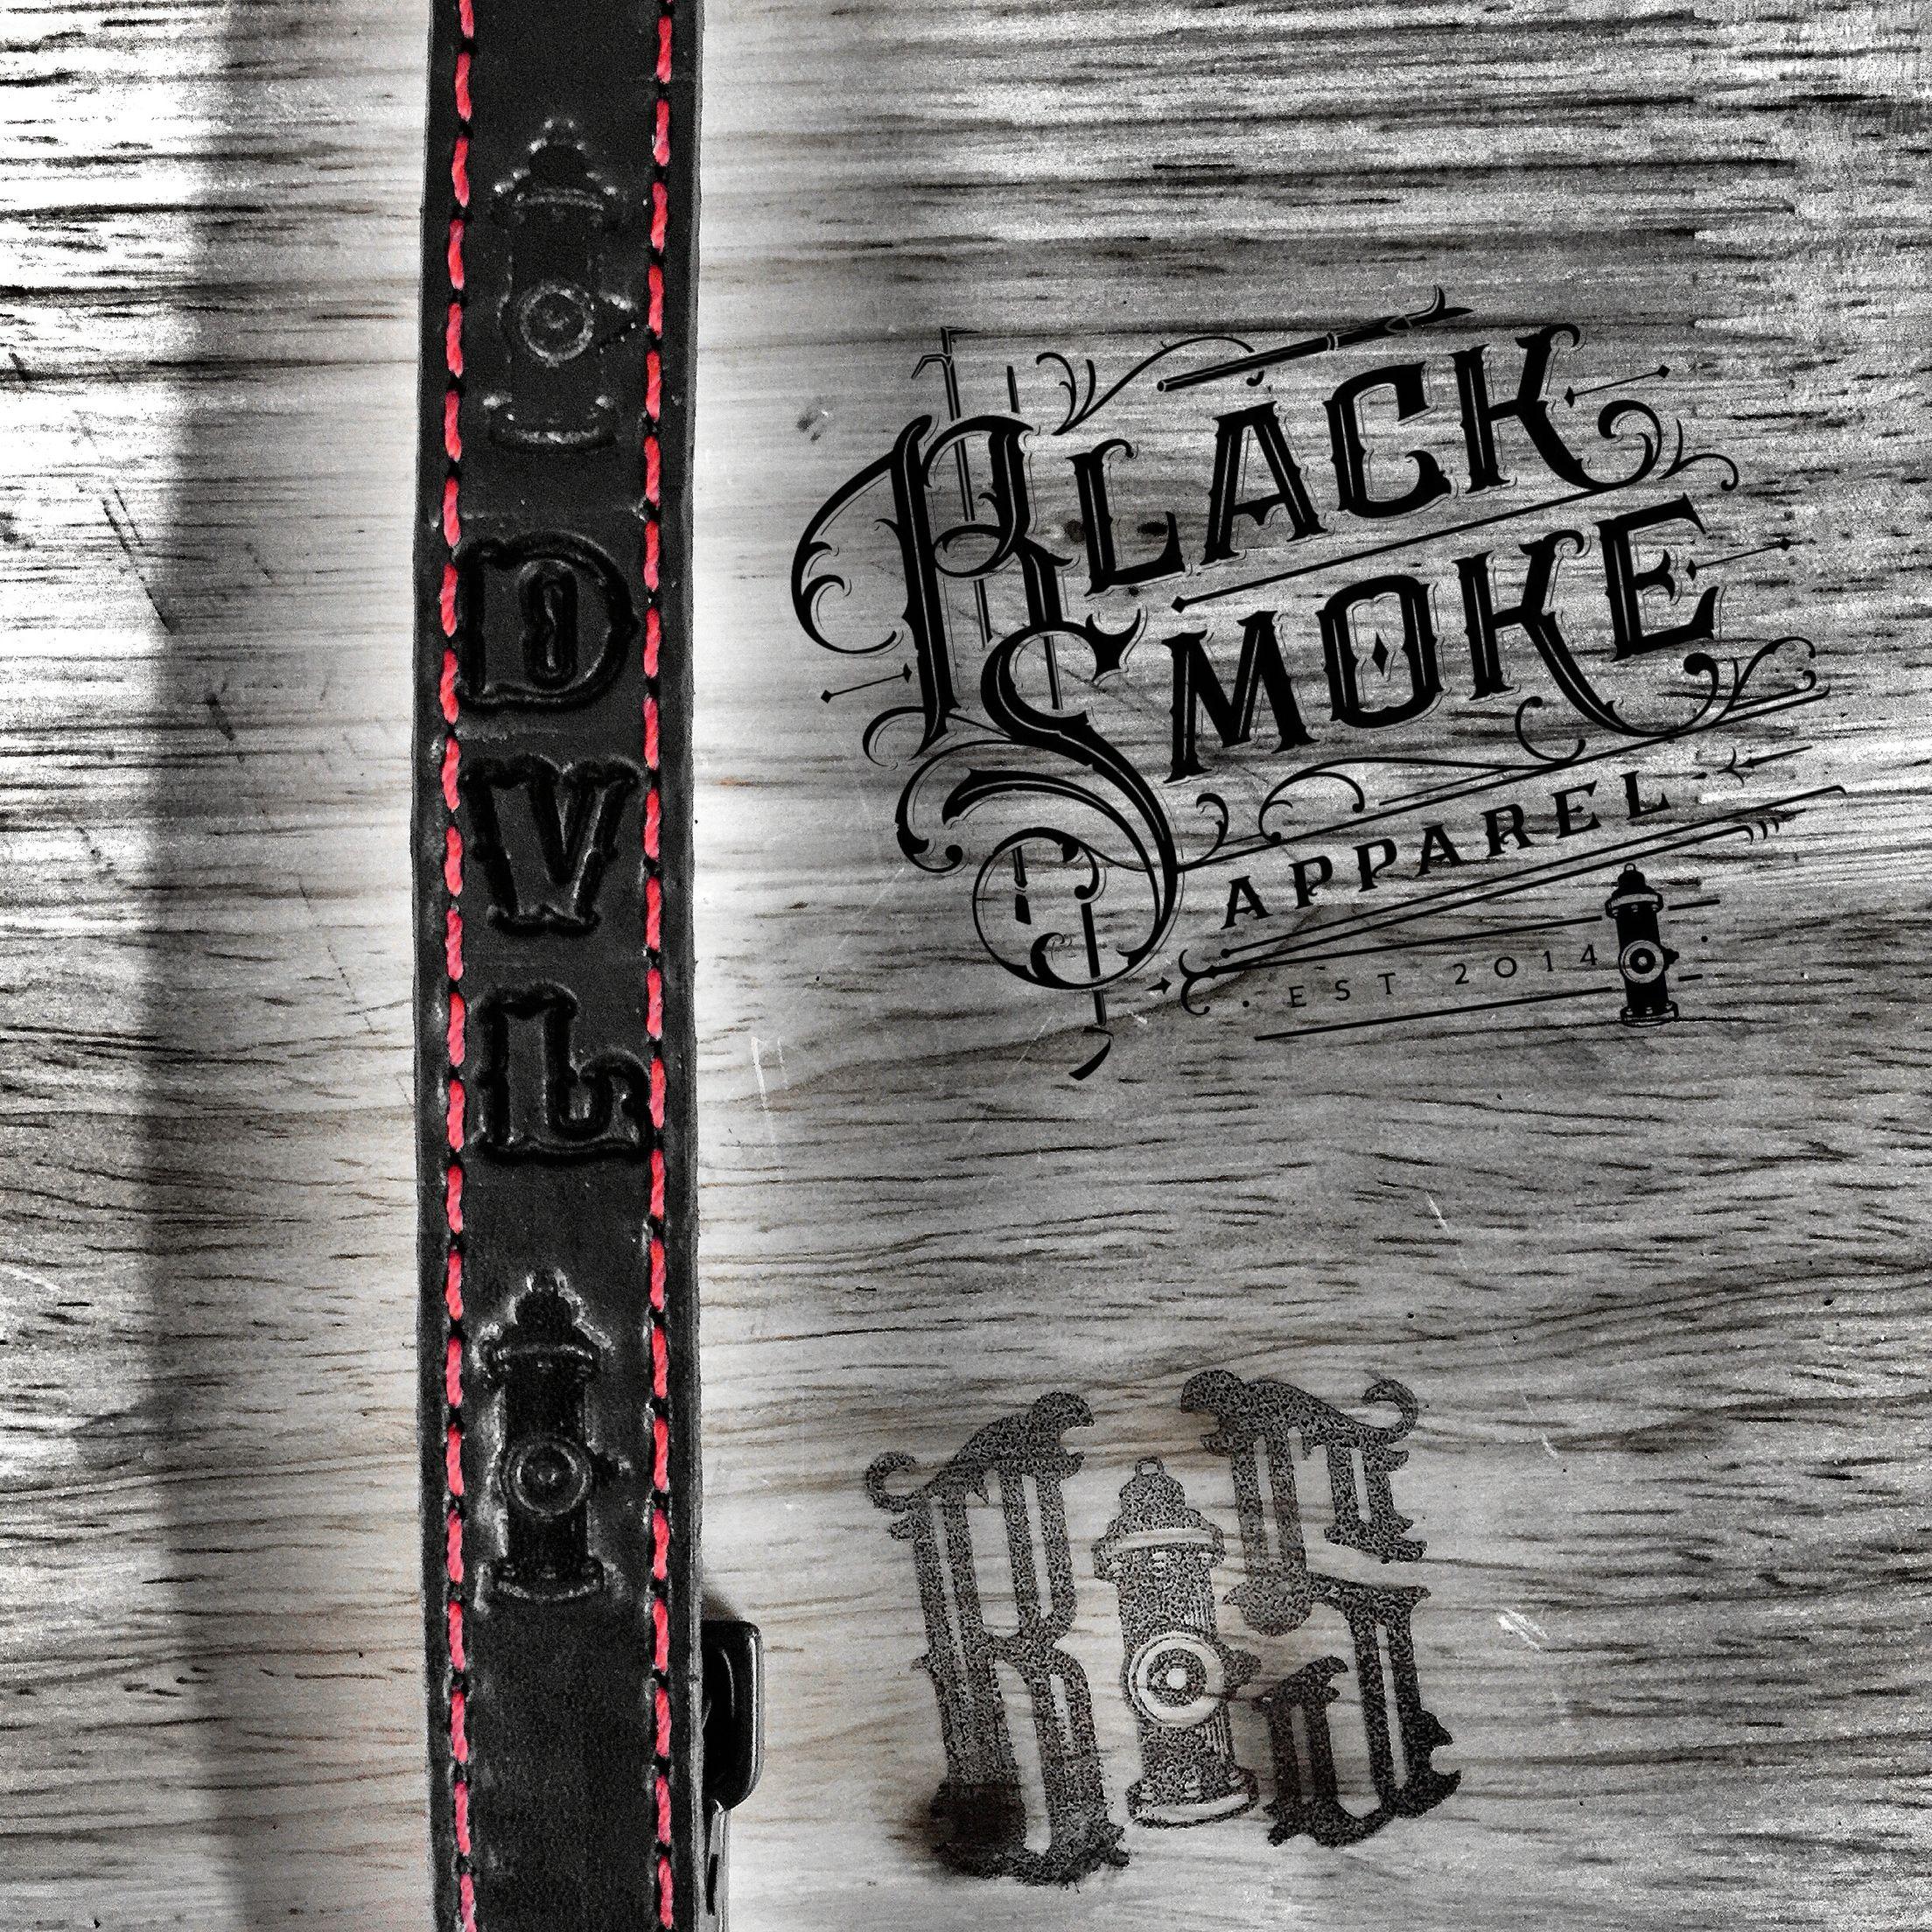 White apron chef fresno - Fresno Glove Strap From Black Smoke Apparel At Www Blacksmokeapparel Com